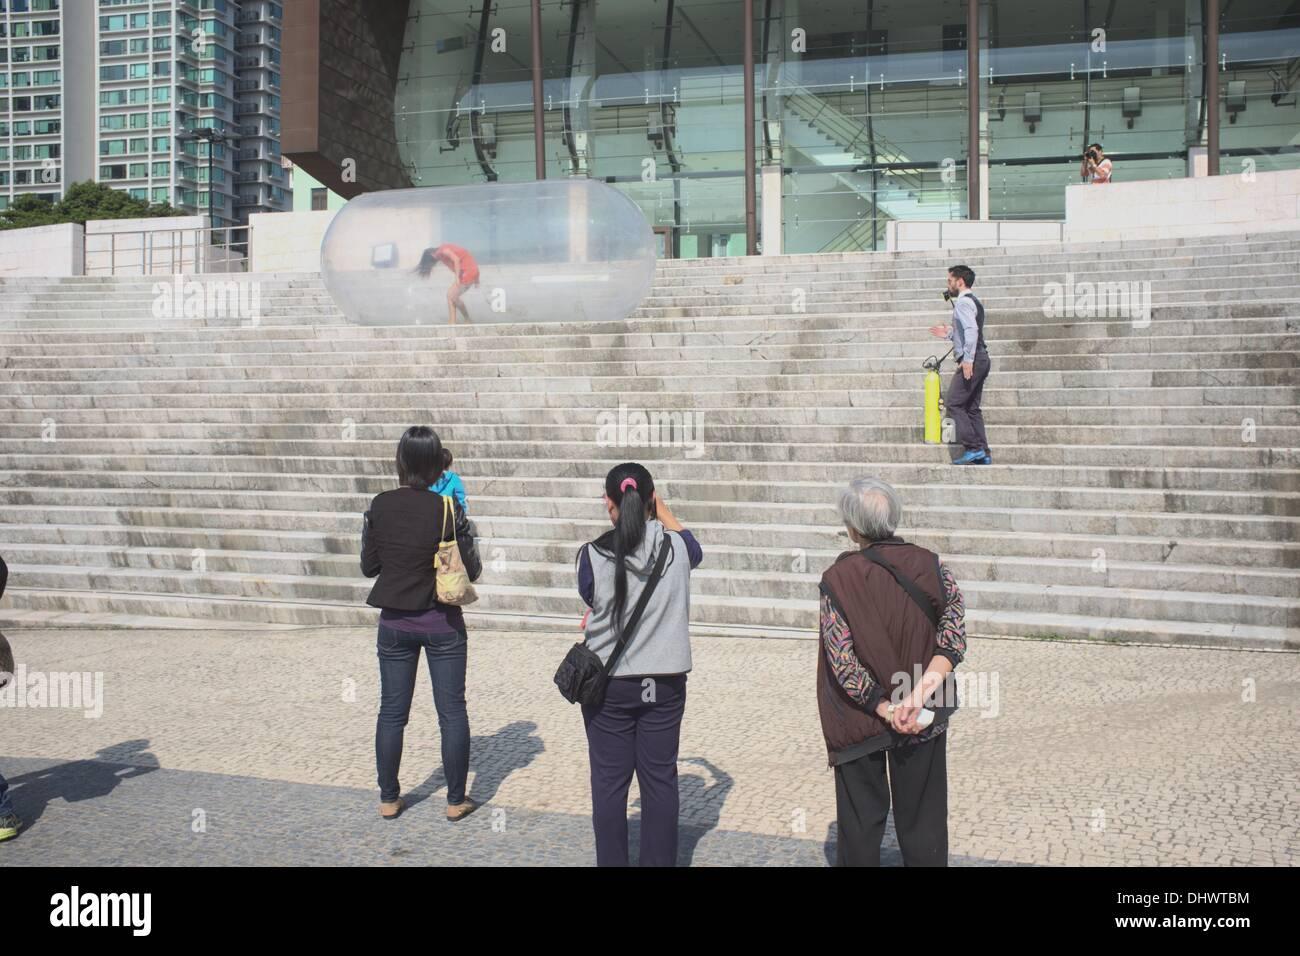 Macau S A R China Stock Photos & Macau S A R China Stock Images - Alamy